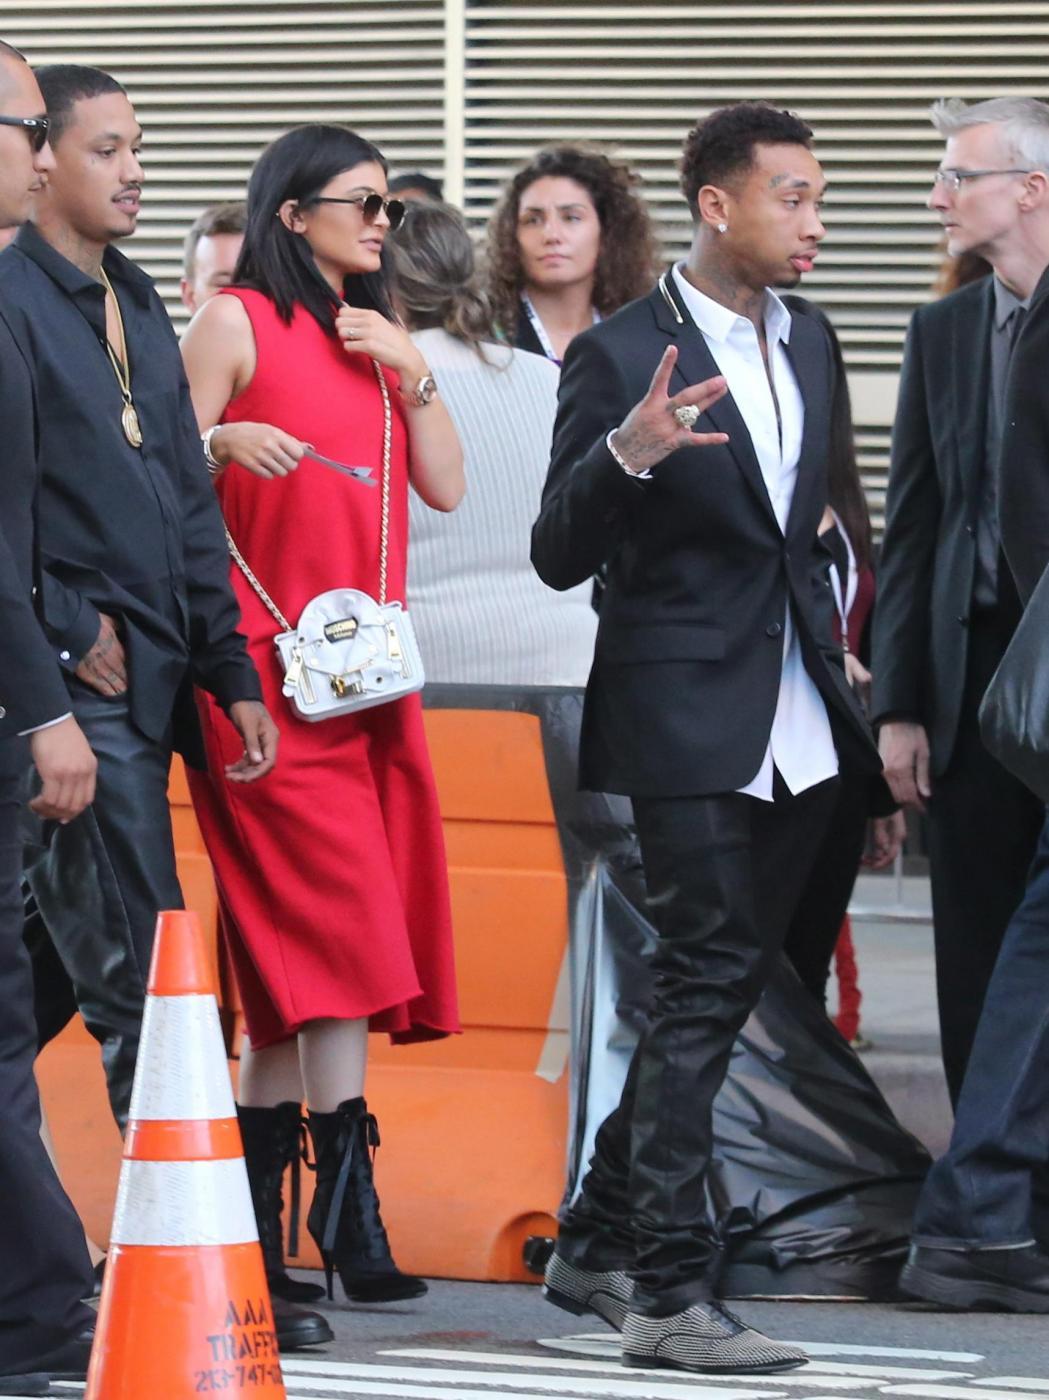 Kylie Jenner insieme al fidanzato Tyga FOTO 1